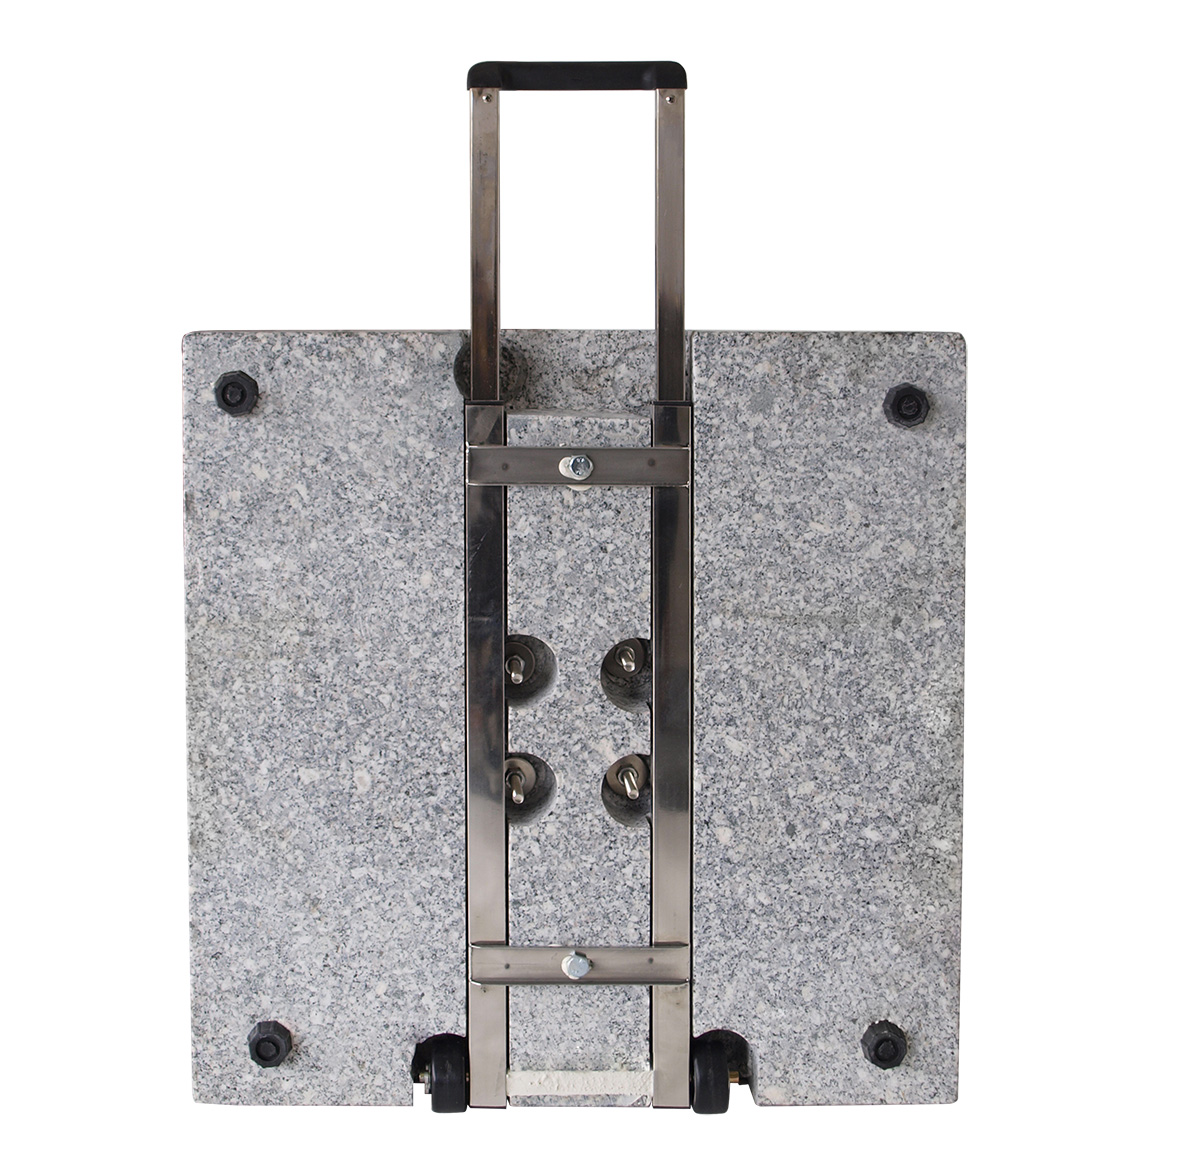 schirmst nder aus poliertem granit granitst nder 60kg eckig mit rollen haiger. Black Bedroom Furniture Sets. Home Design Ideas